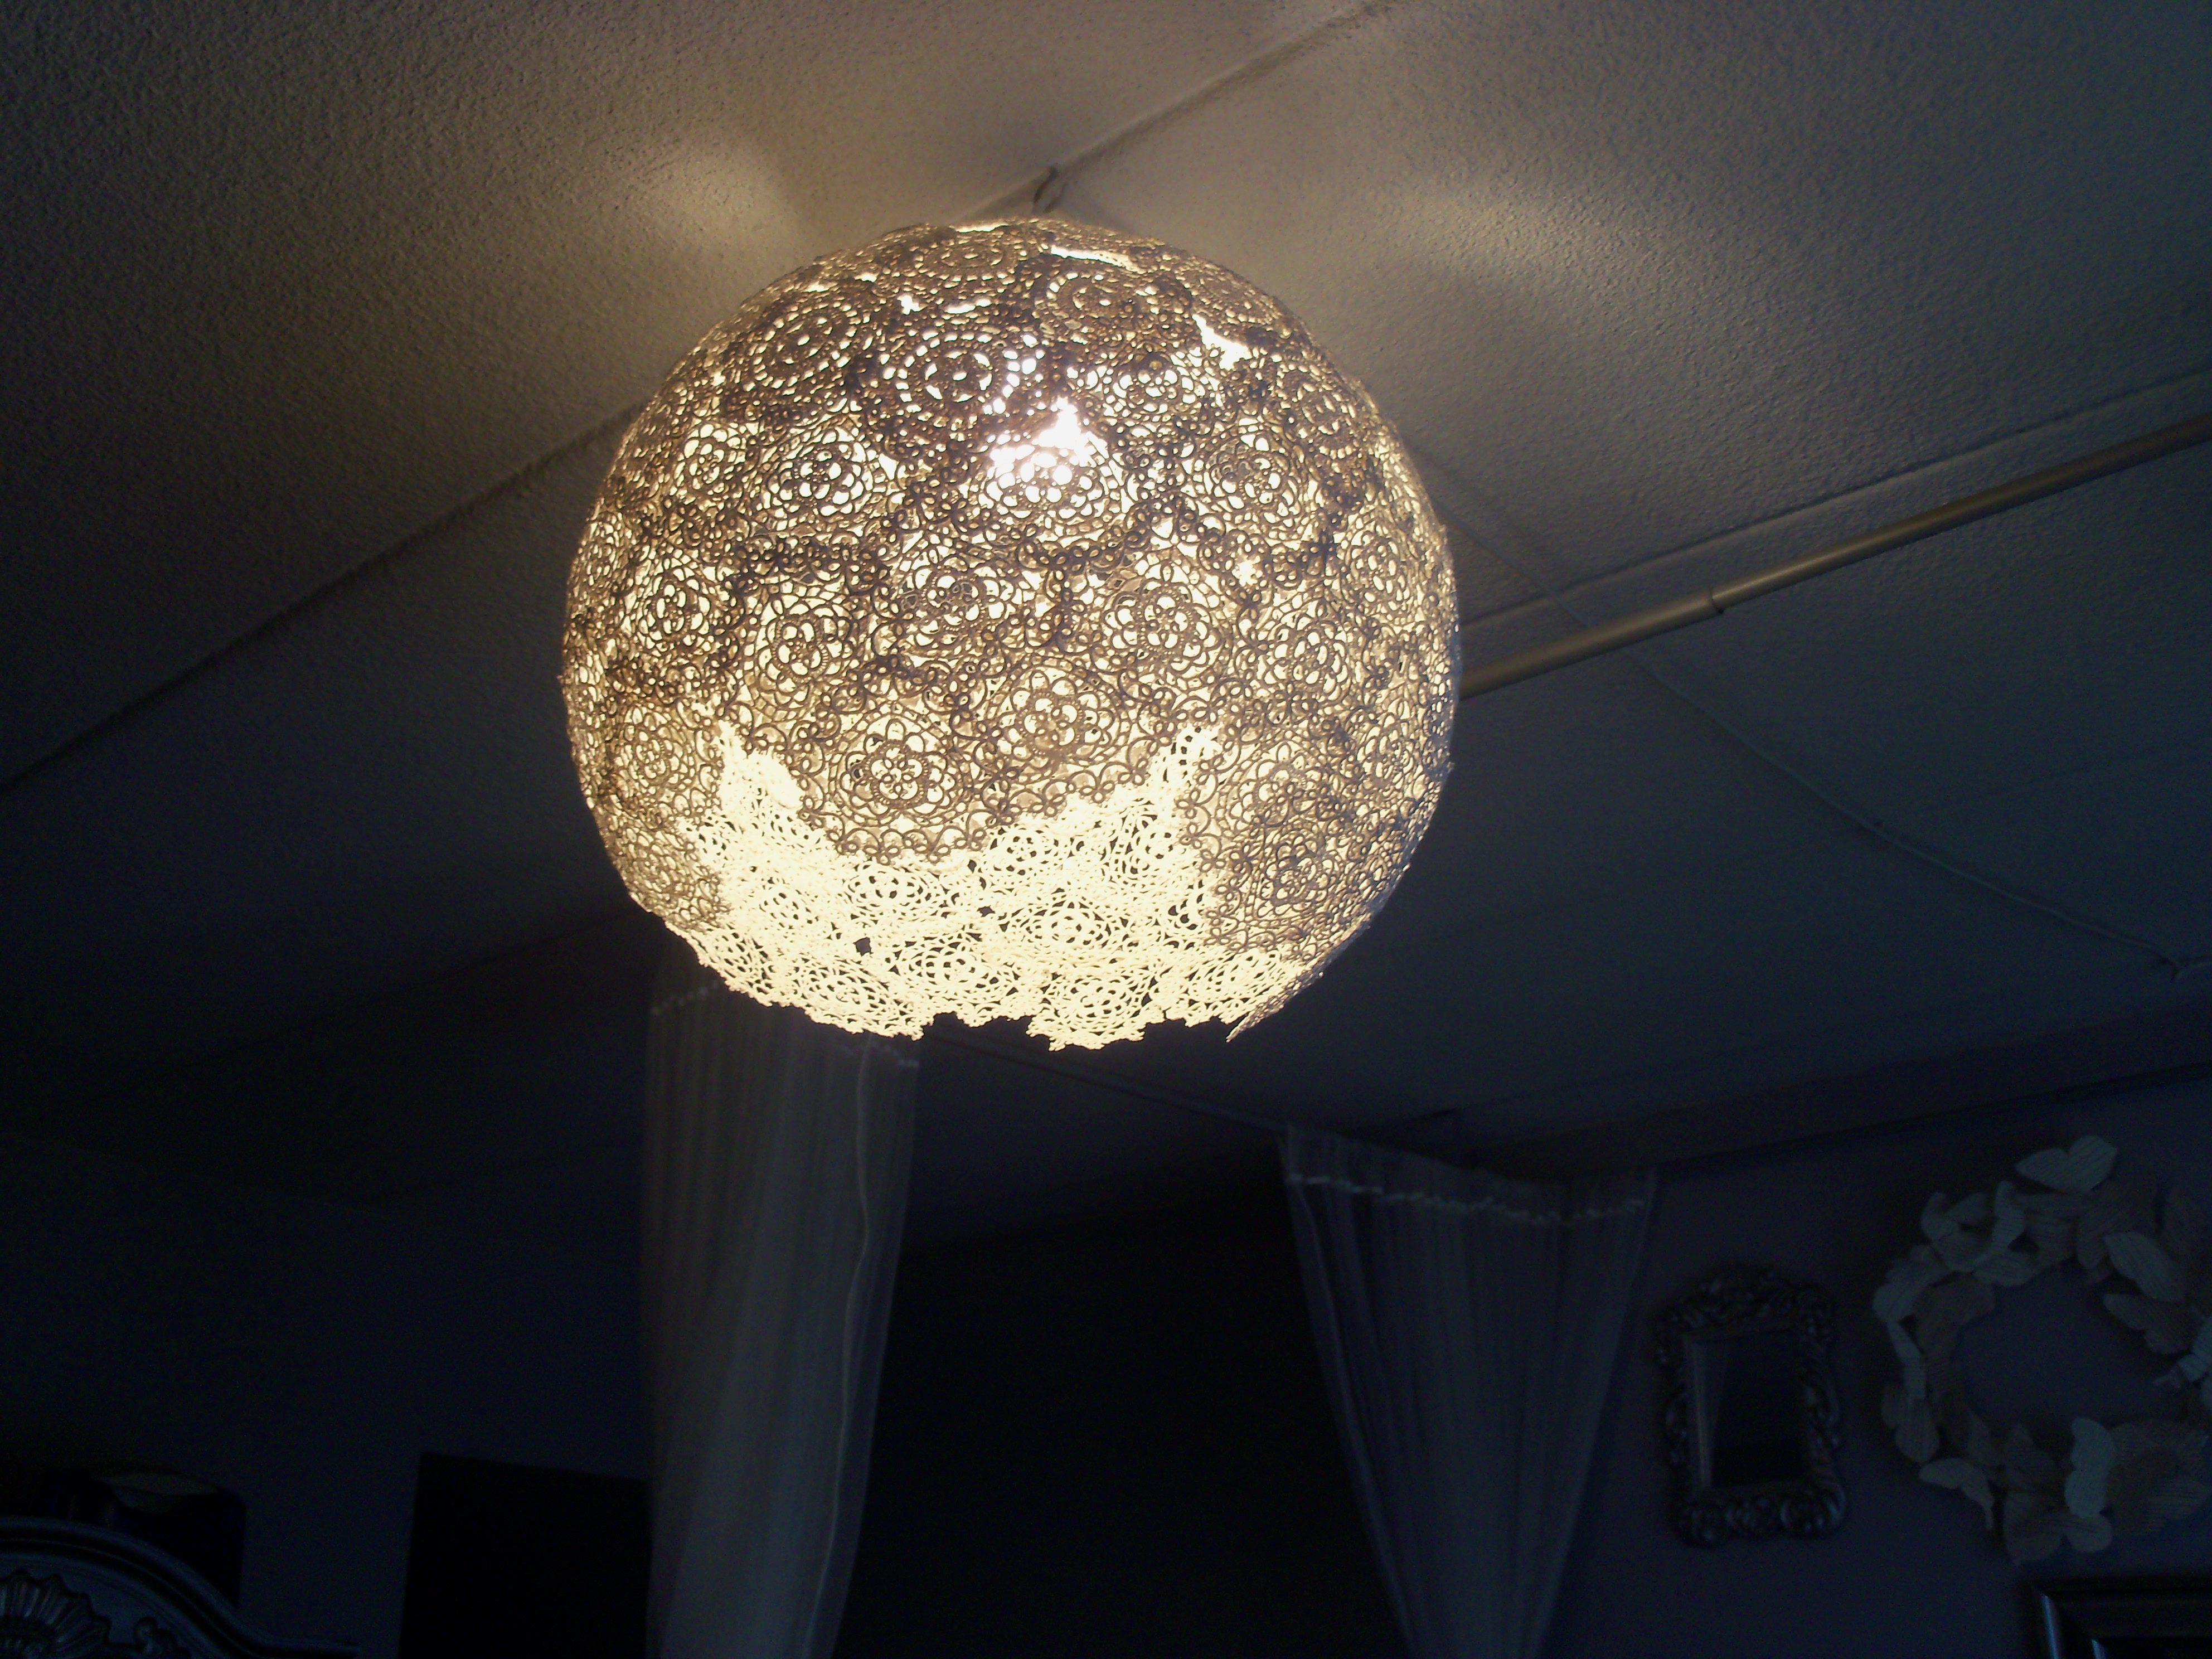 Diy lace doily lantern grace helene jewelry accessories crafts diy lace doily lantern grace helene jewelry accessories arubaitofo Image collections